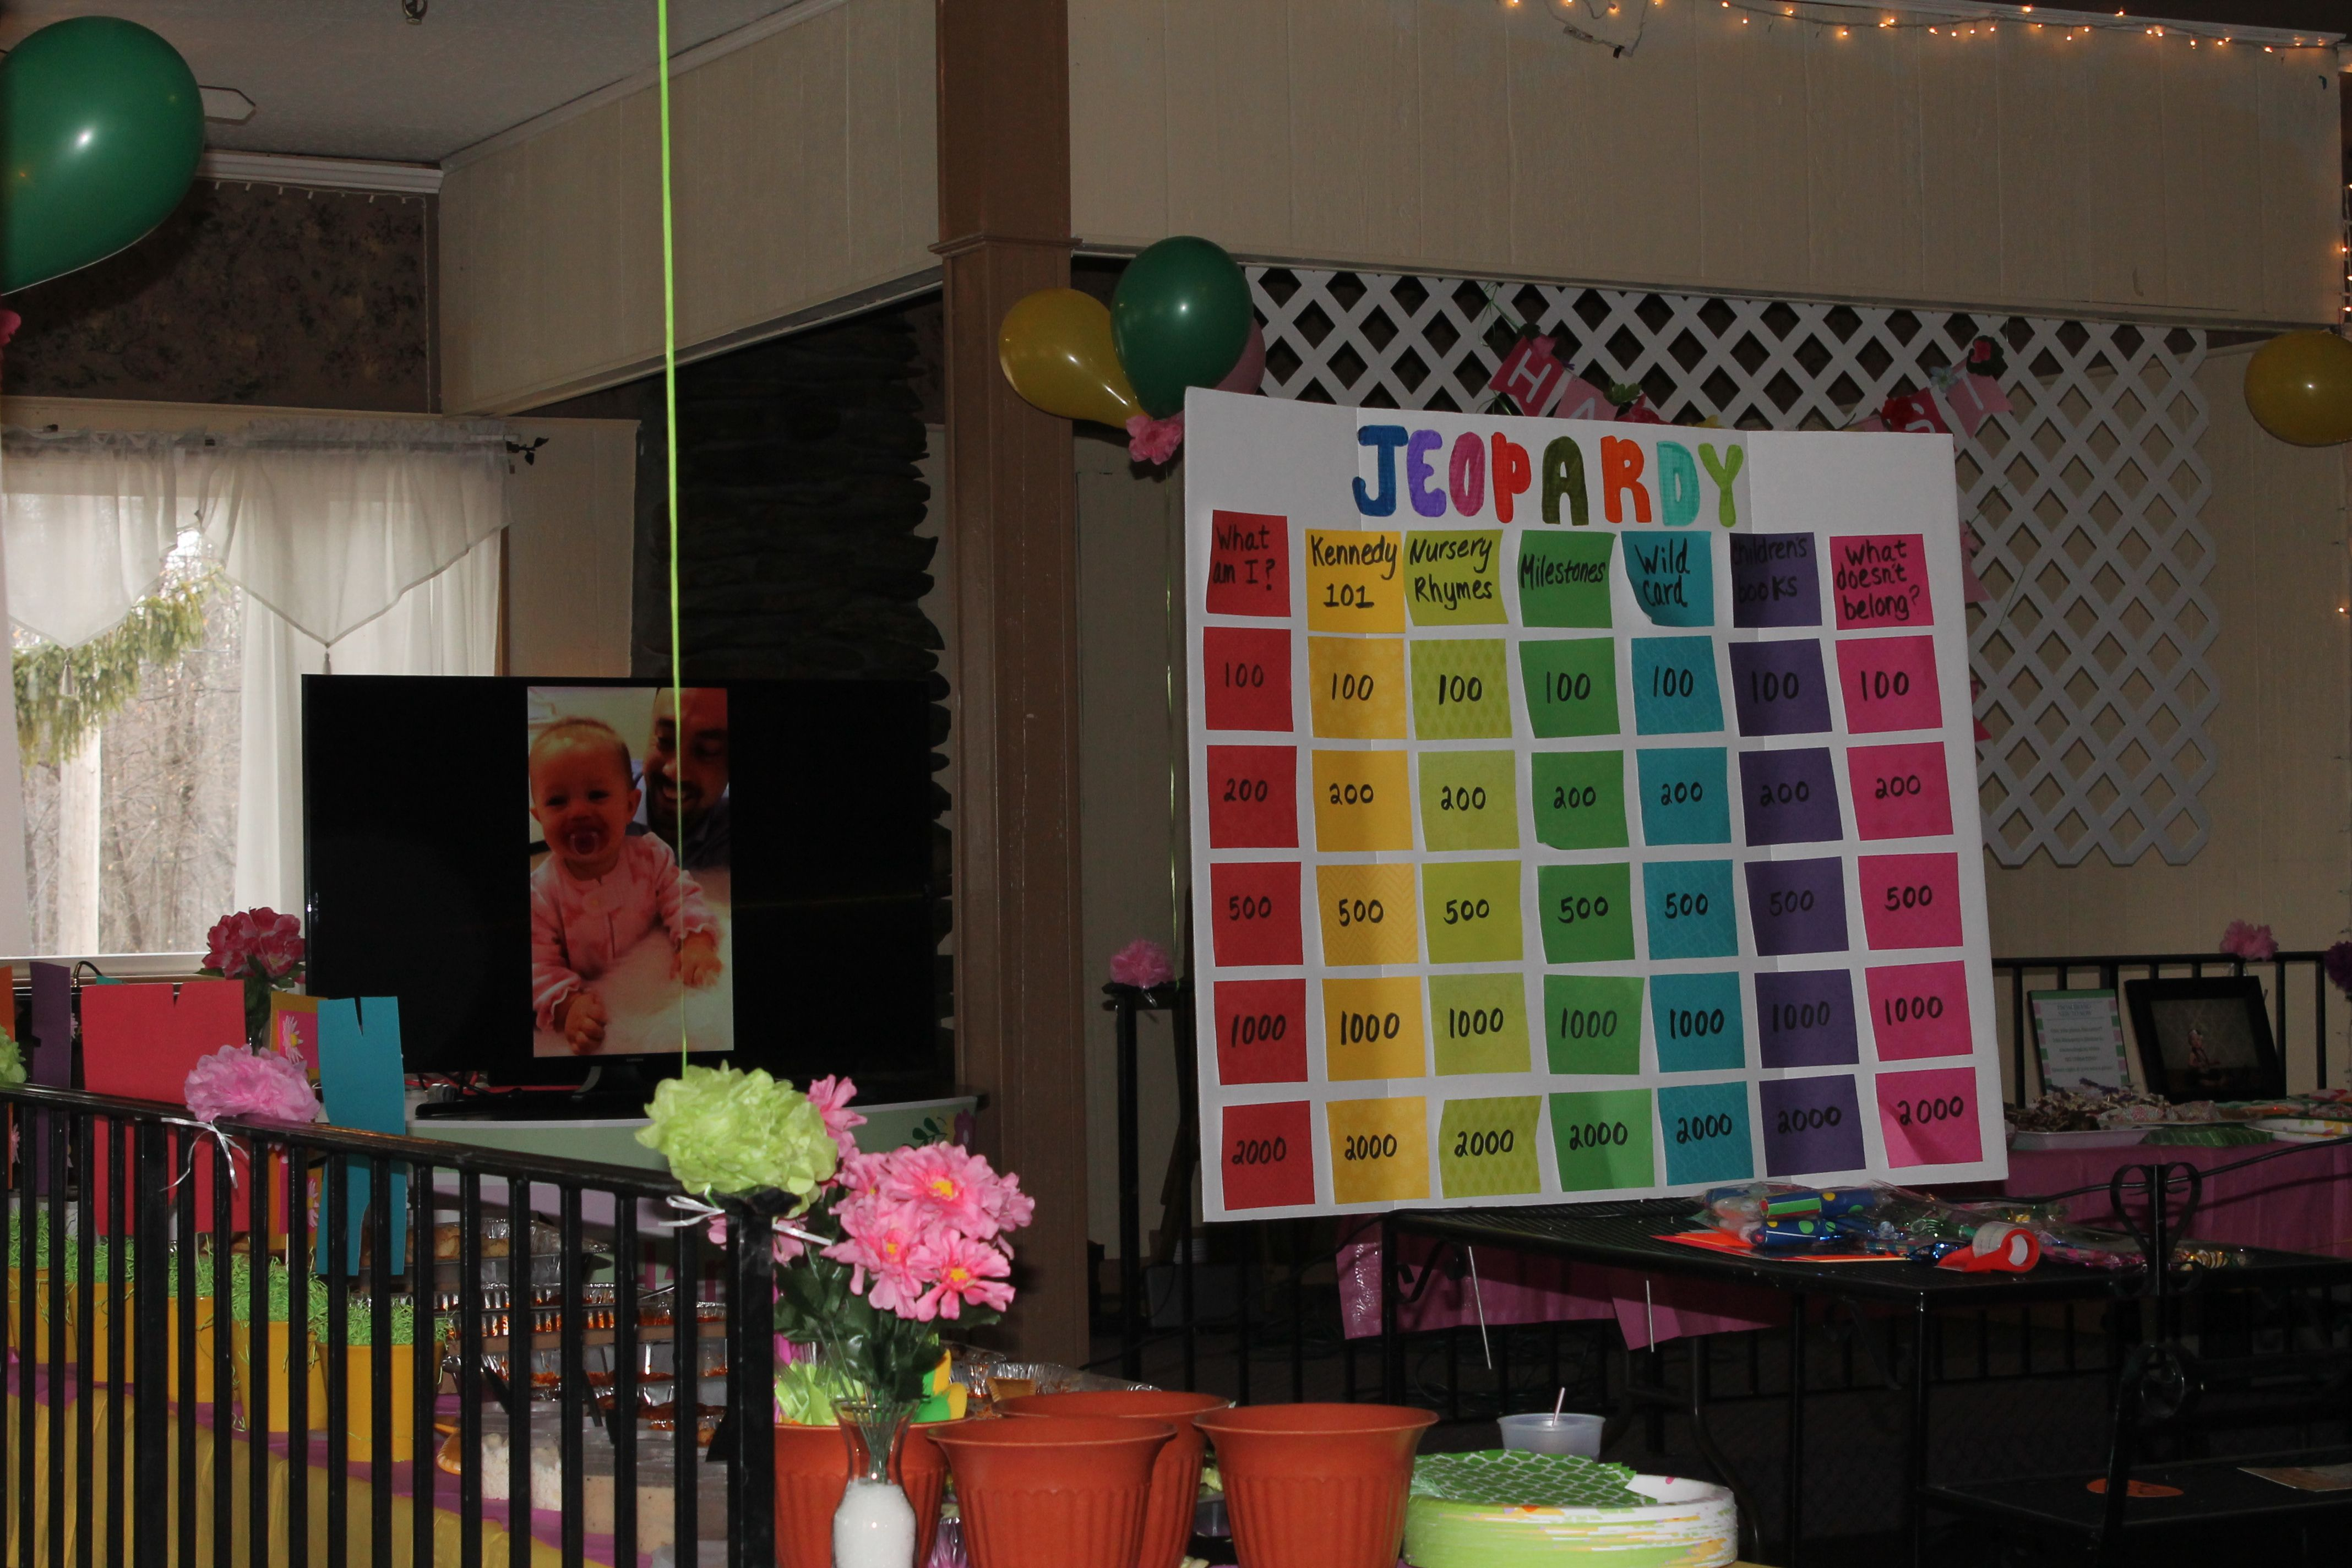 First Birthday Jeopardy Party Games Birthday Party Games Games For Adults 1st Birthday Games First Birthday Activities Birthday Games For Adults